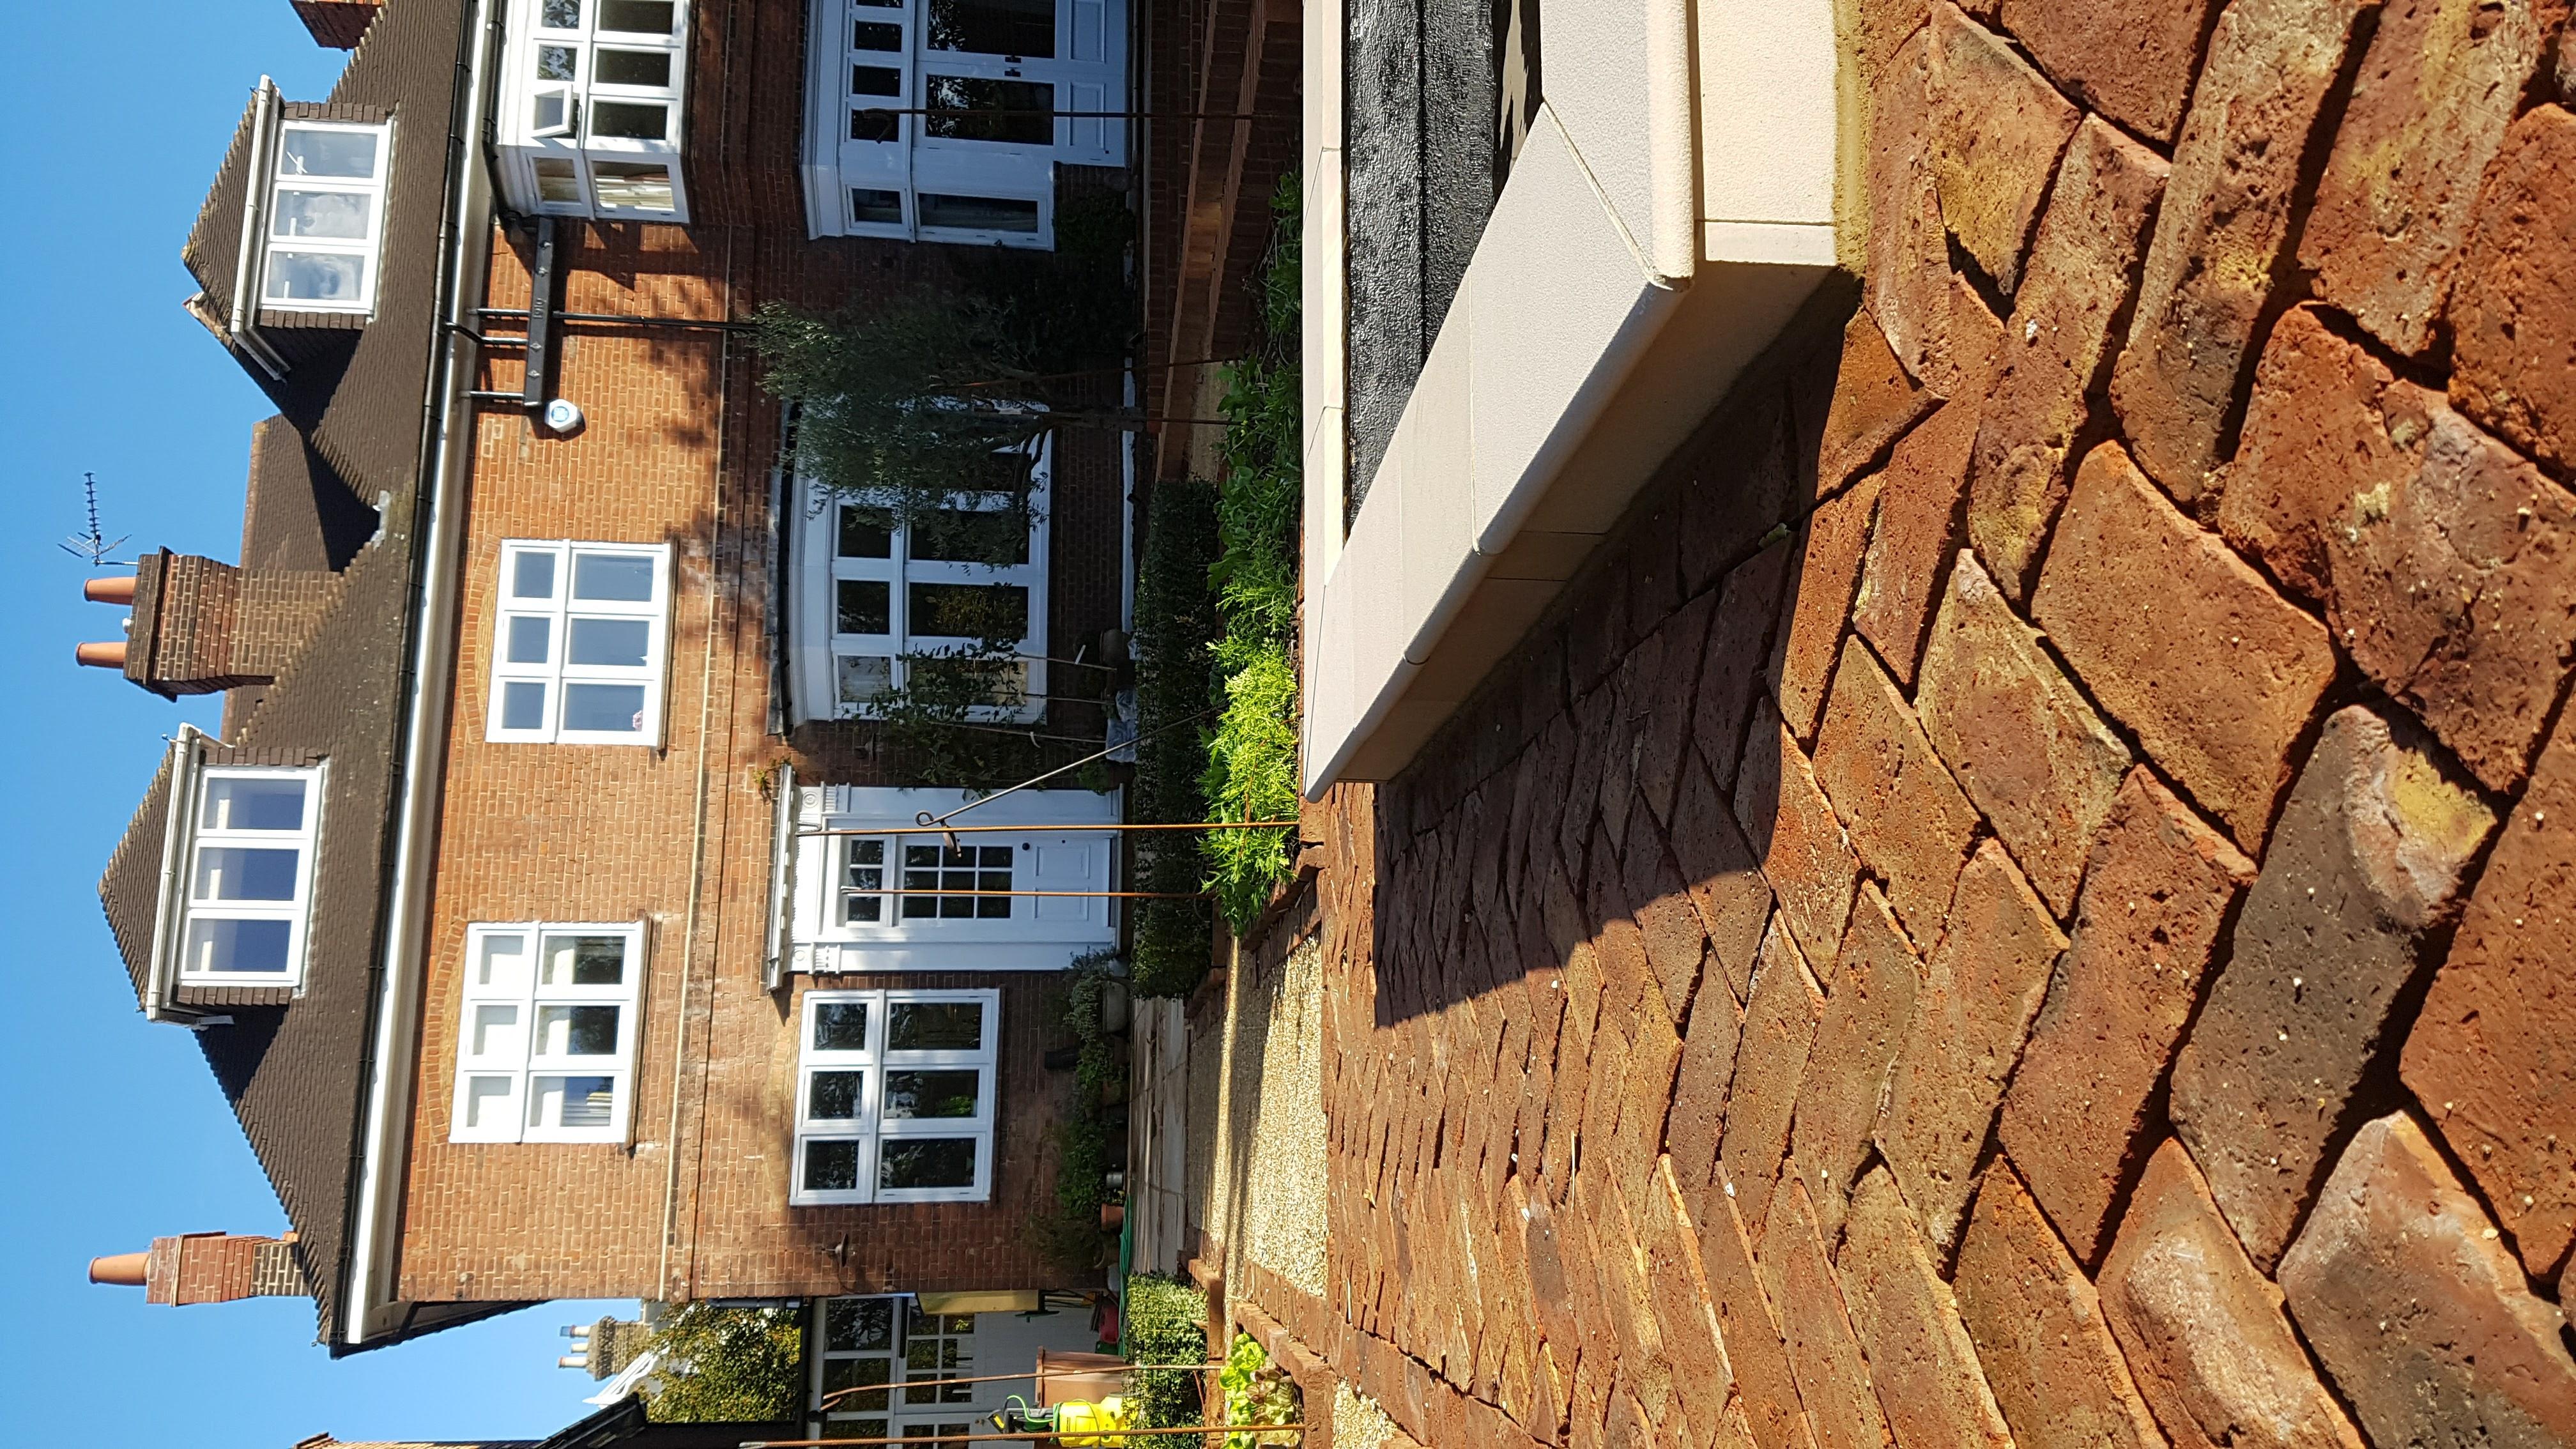 Pond, brick work - full works